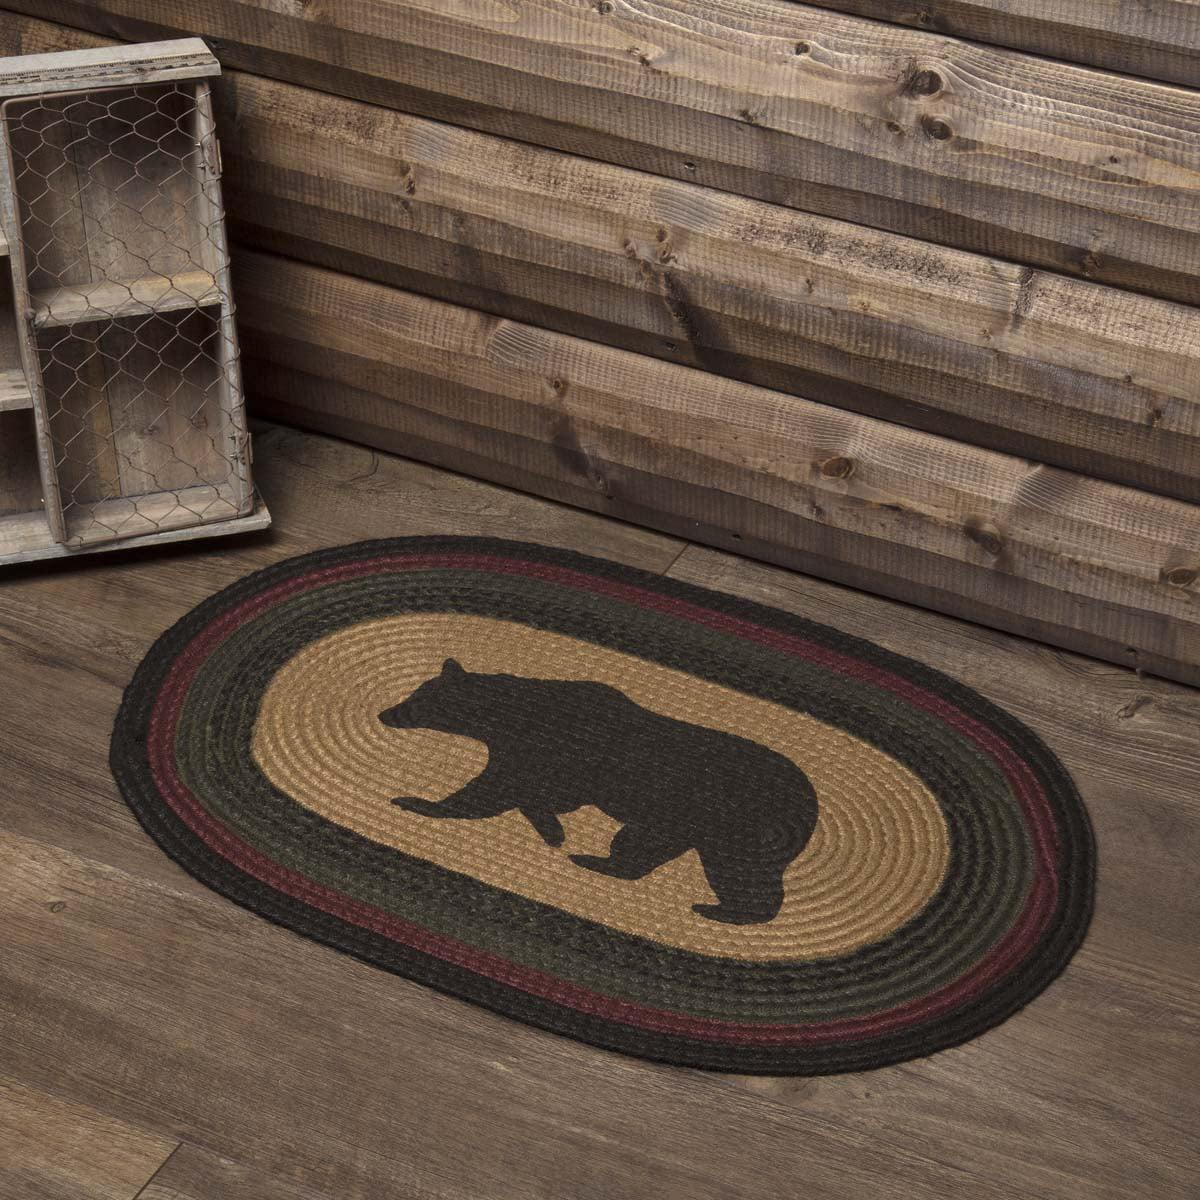 Walmart Moose Rug: Dark Tan Rustic & Lodge Flooring Laramie Bear Jute